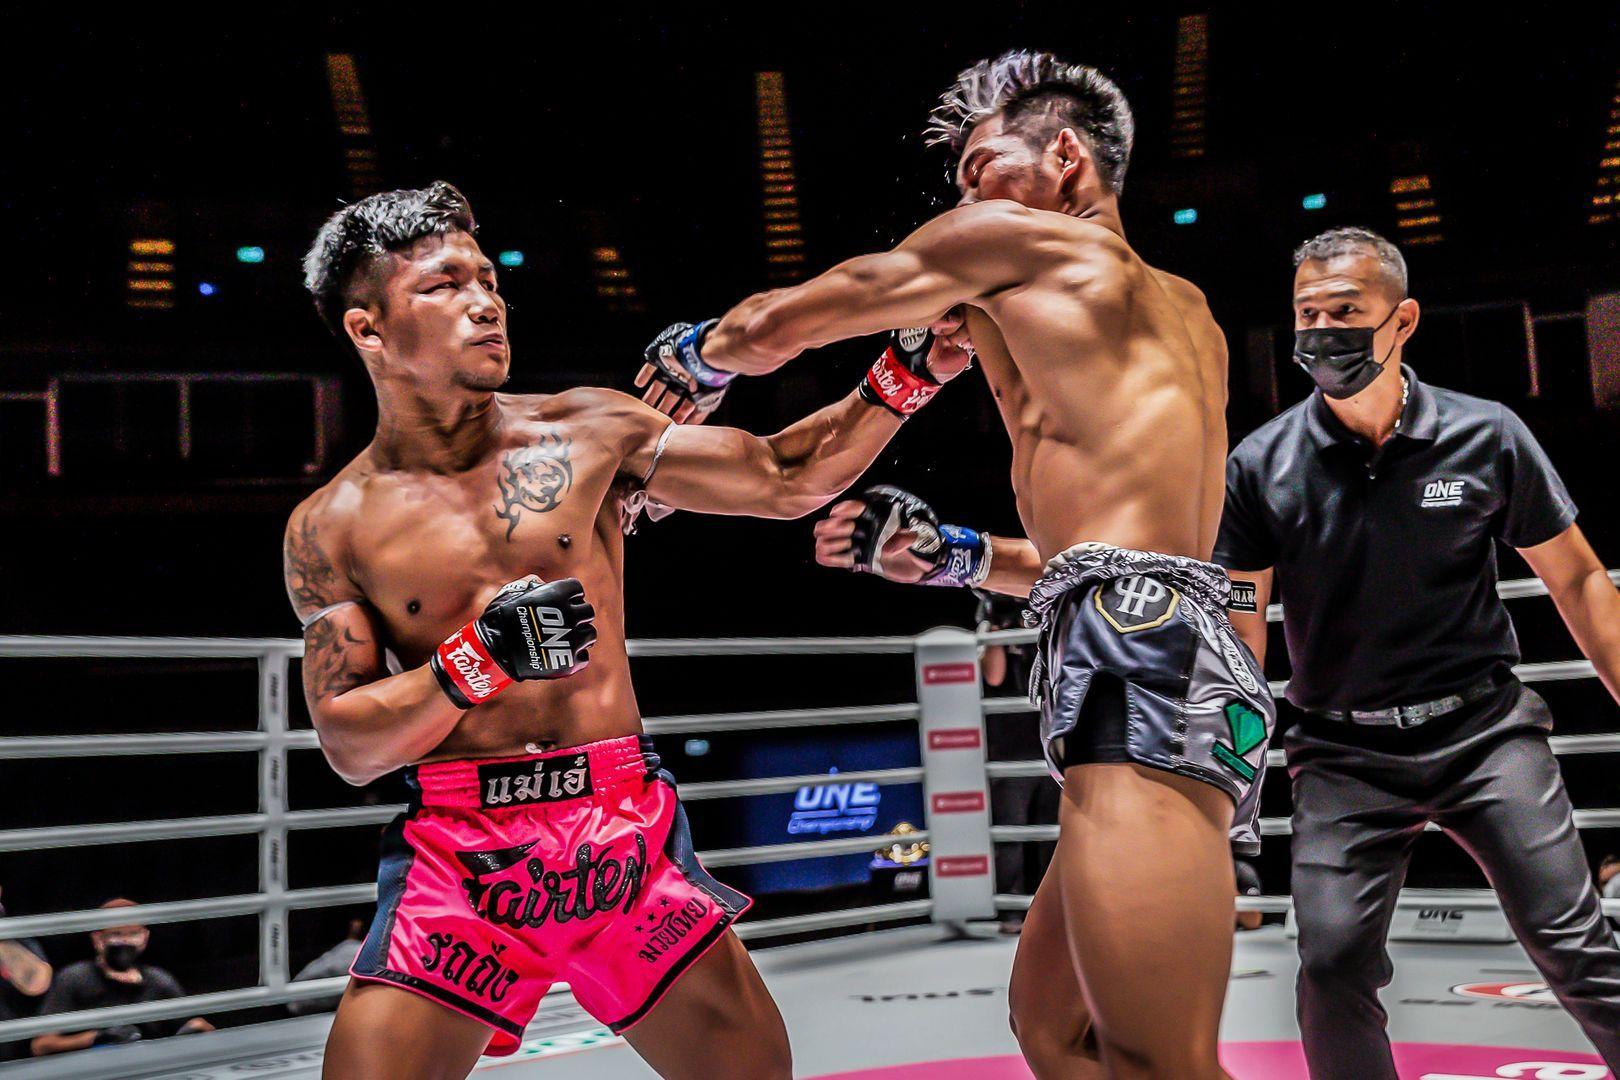 Muay Thai fighter Rodtang Jitmuangnon uppercuts Petchdam Petchyindee Academy